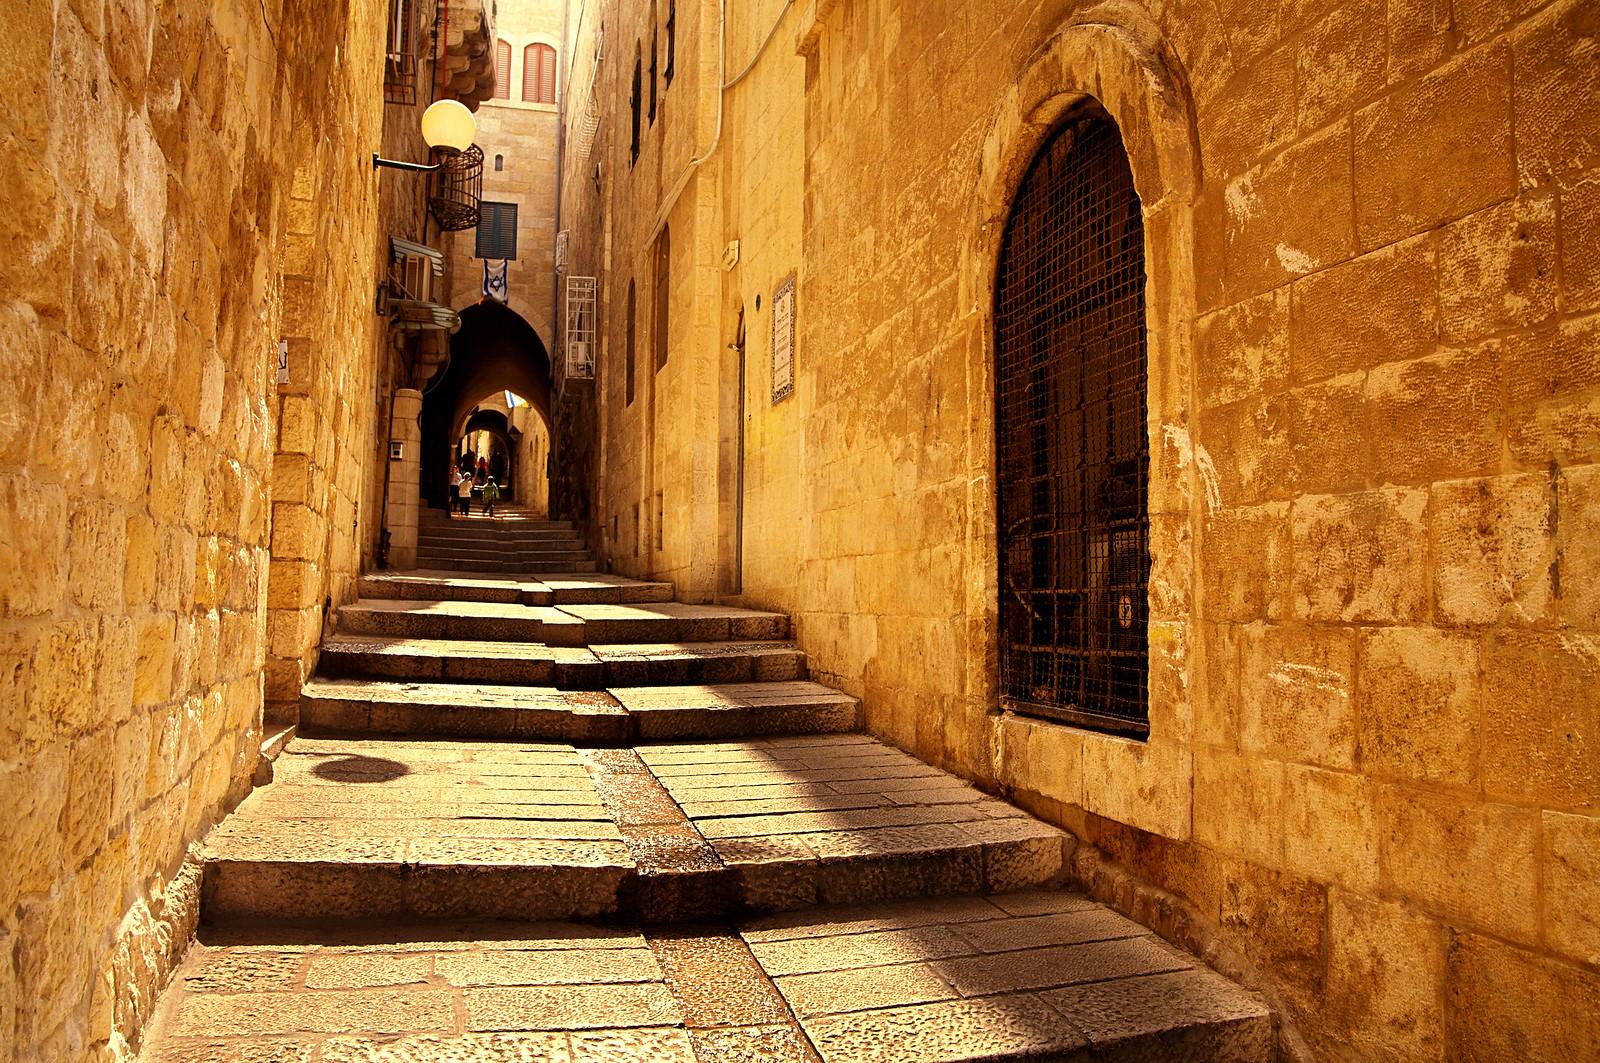 Jerusalem_Old City_Jewish Quater_1_Noam Chen_IMOT